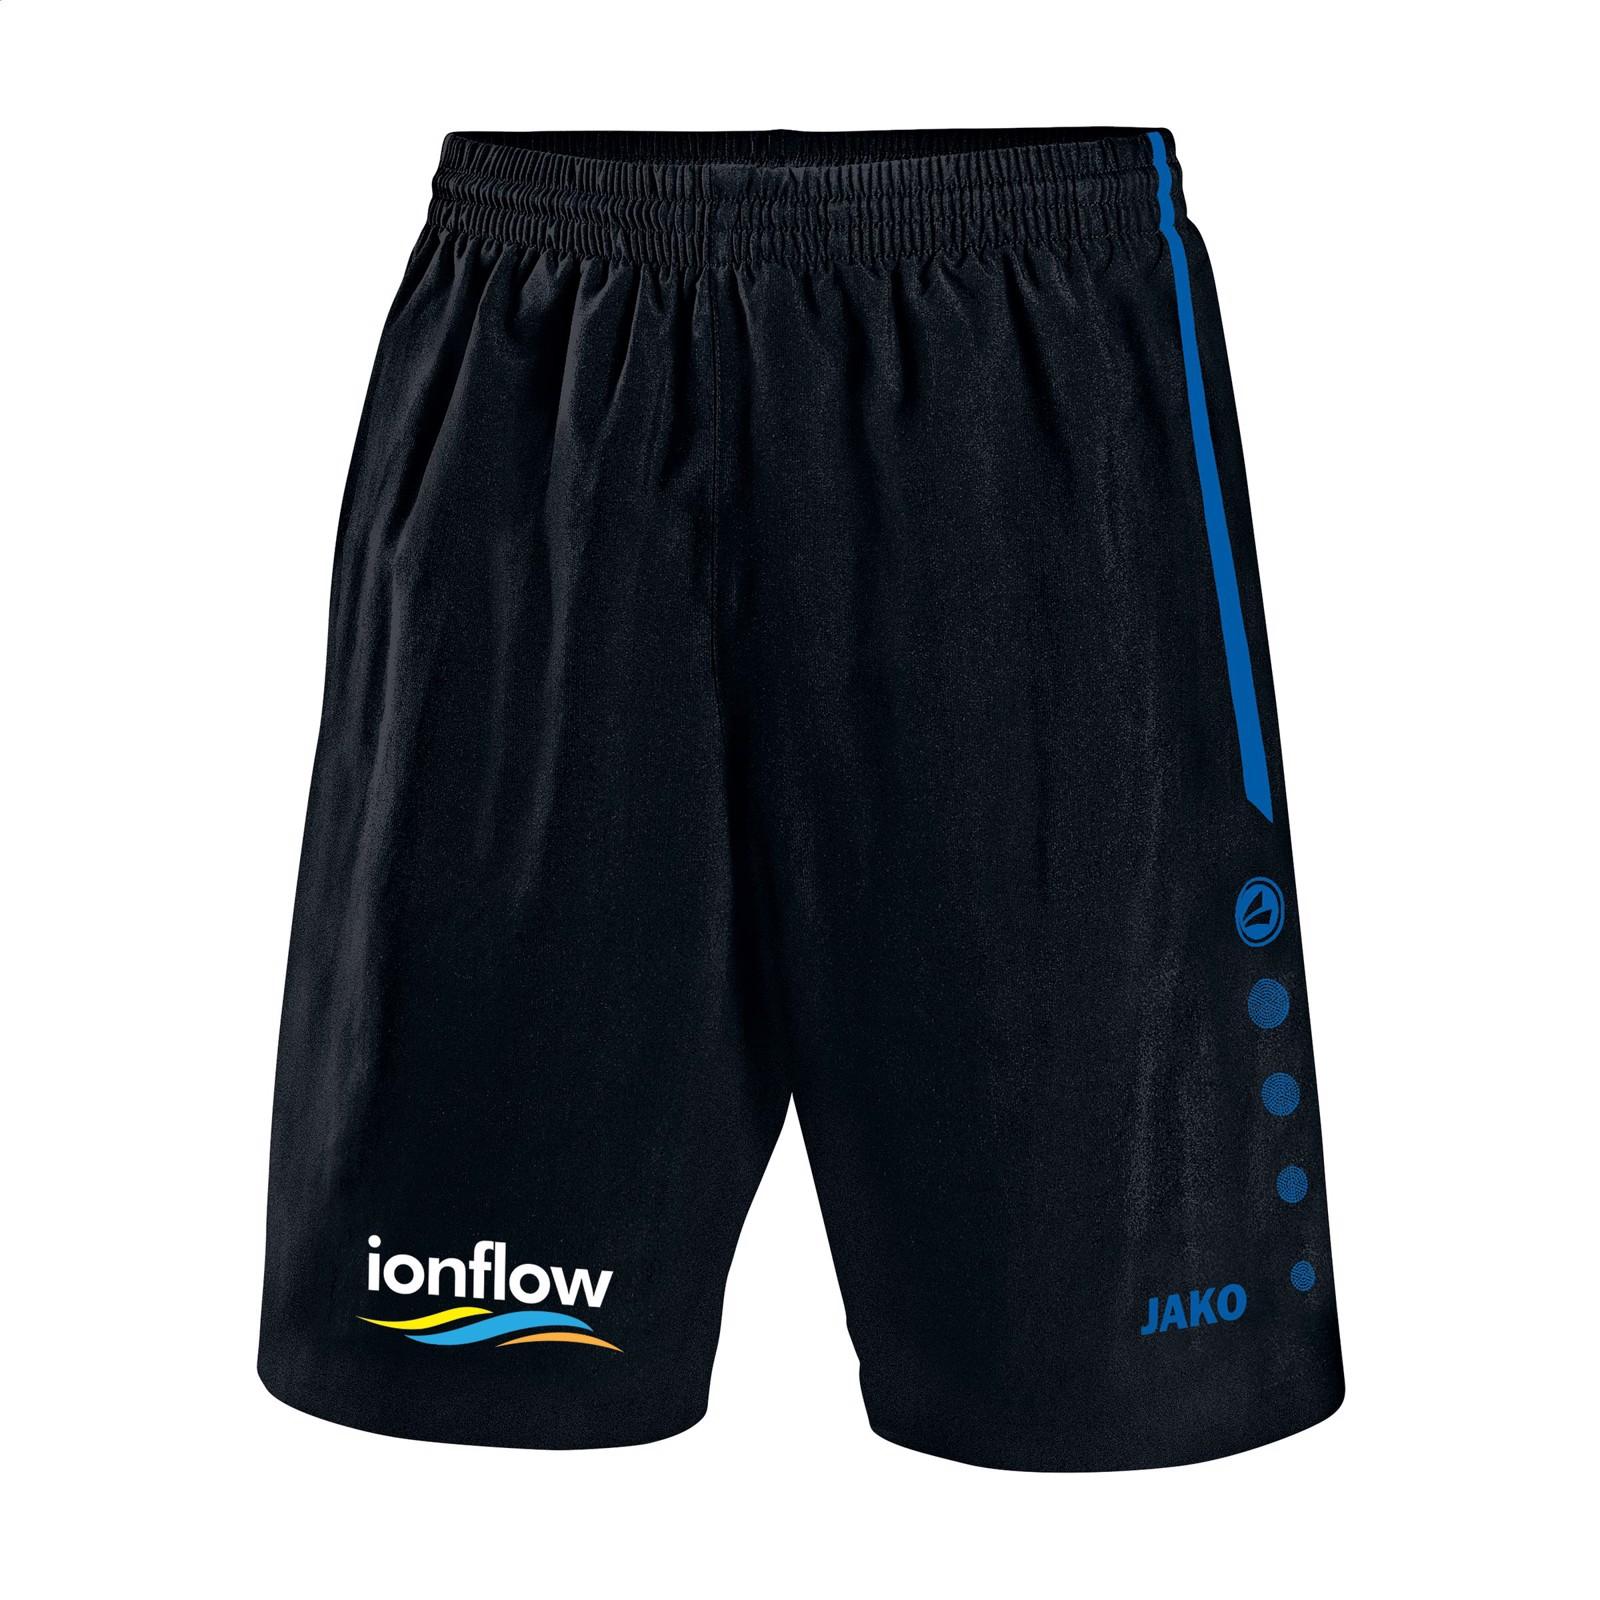 Jako® Short Turin Kids sportspants - Black / Cobalt Blue / 128